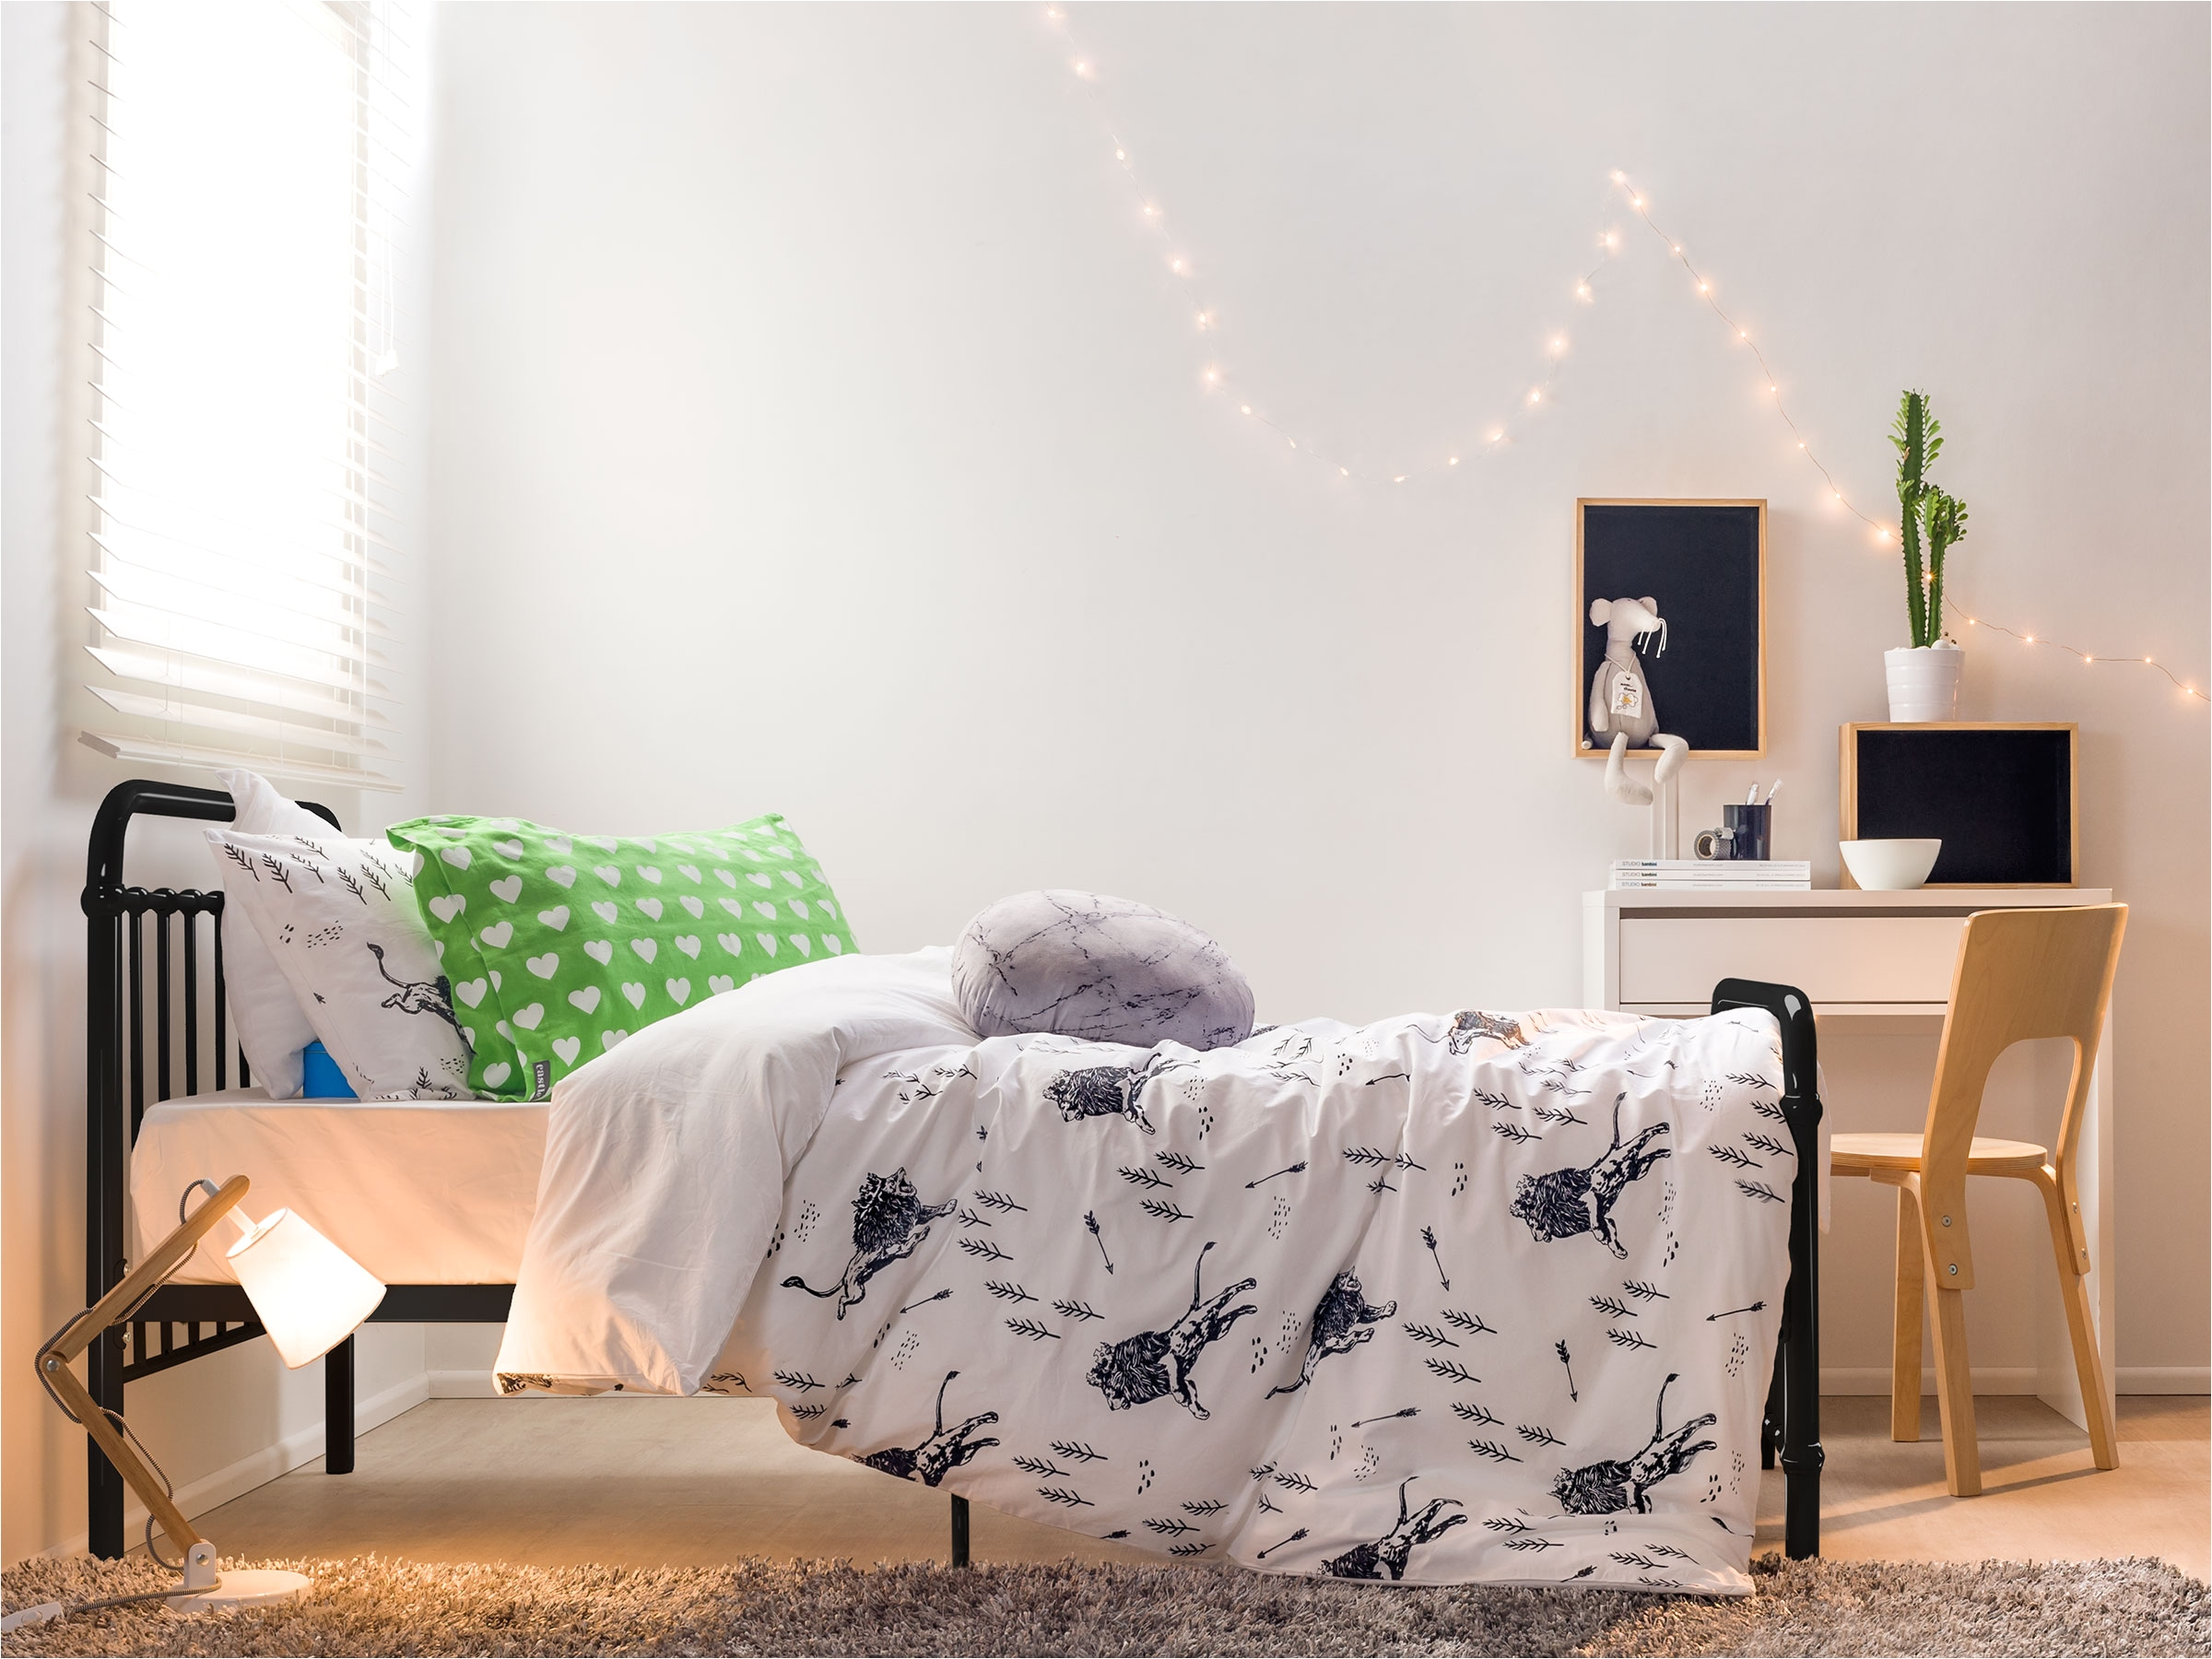 Teenage Chairs for Bedrooms Australia Mocka Jordi Desk Kids Bedroom Furniture